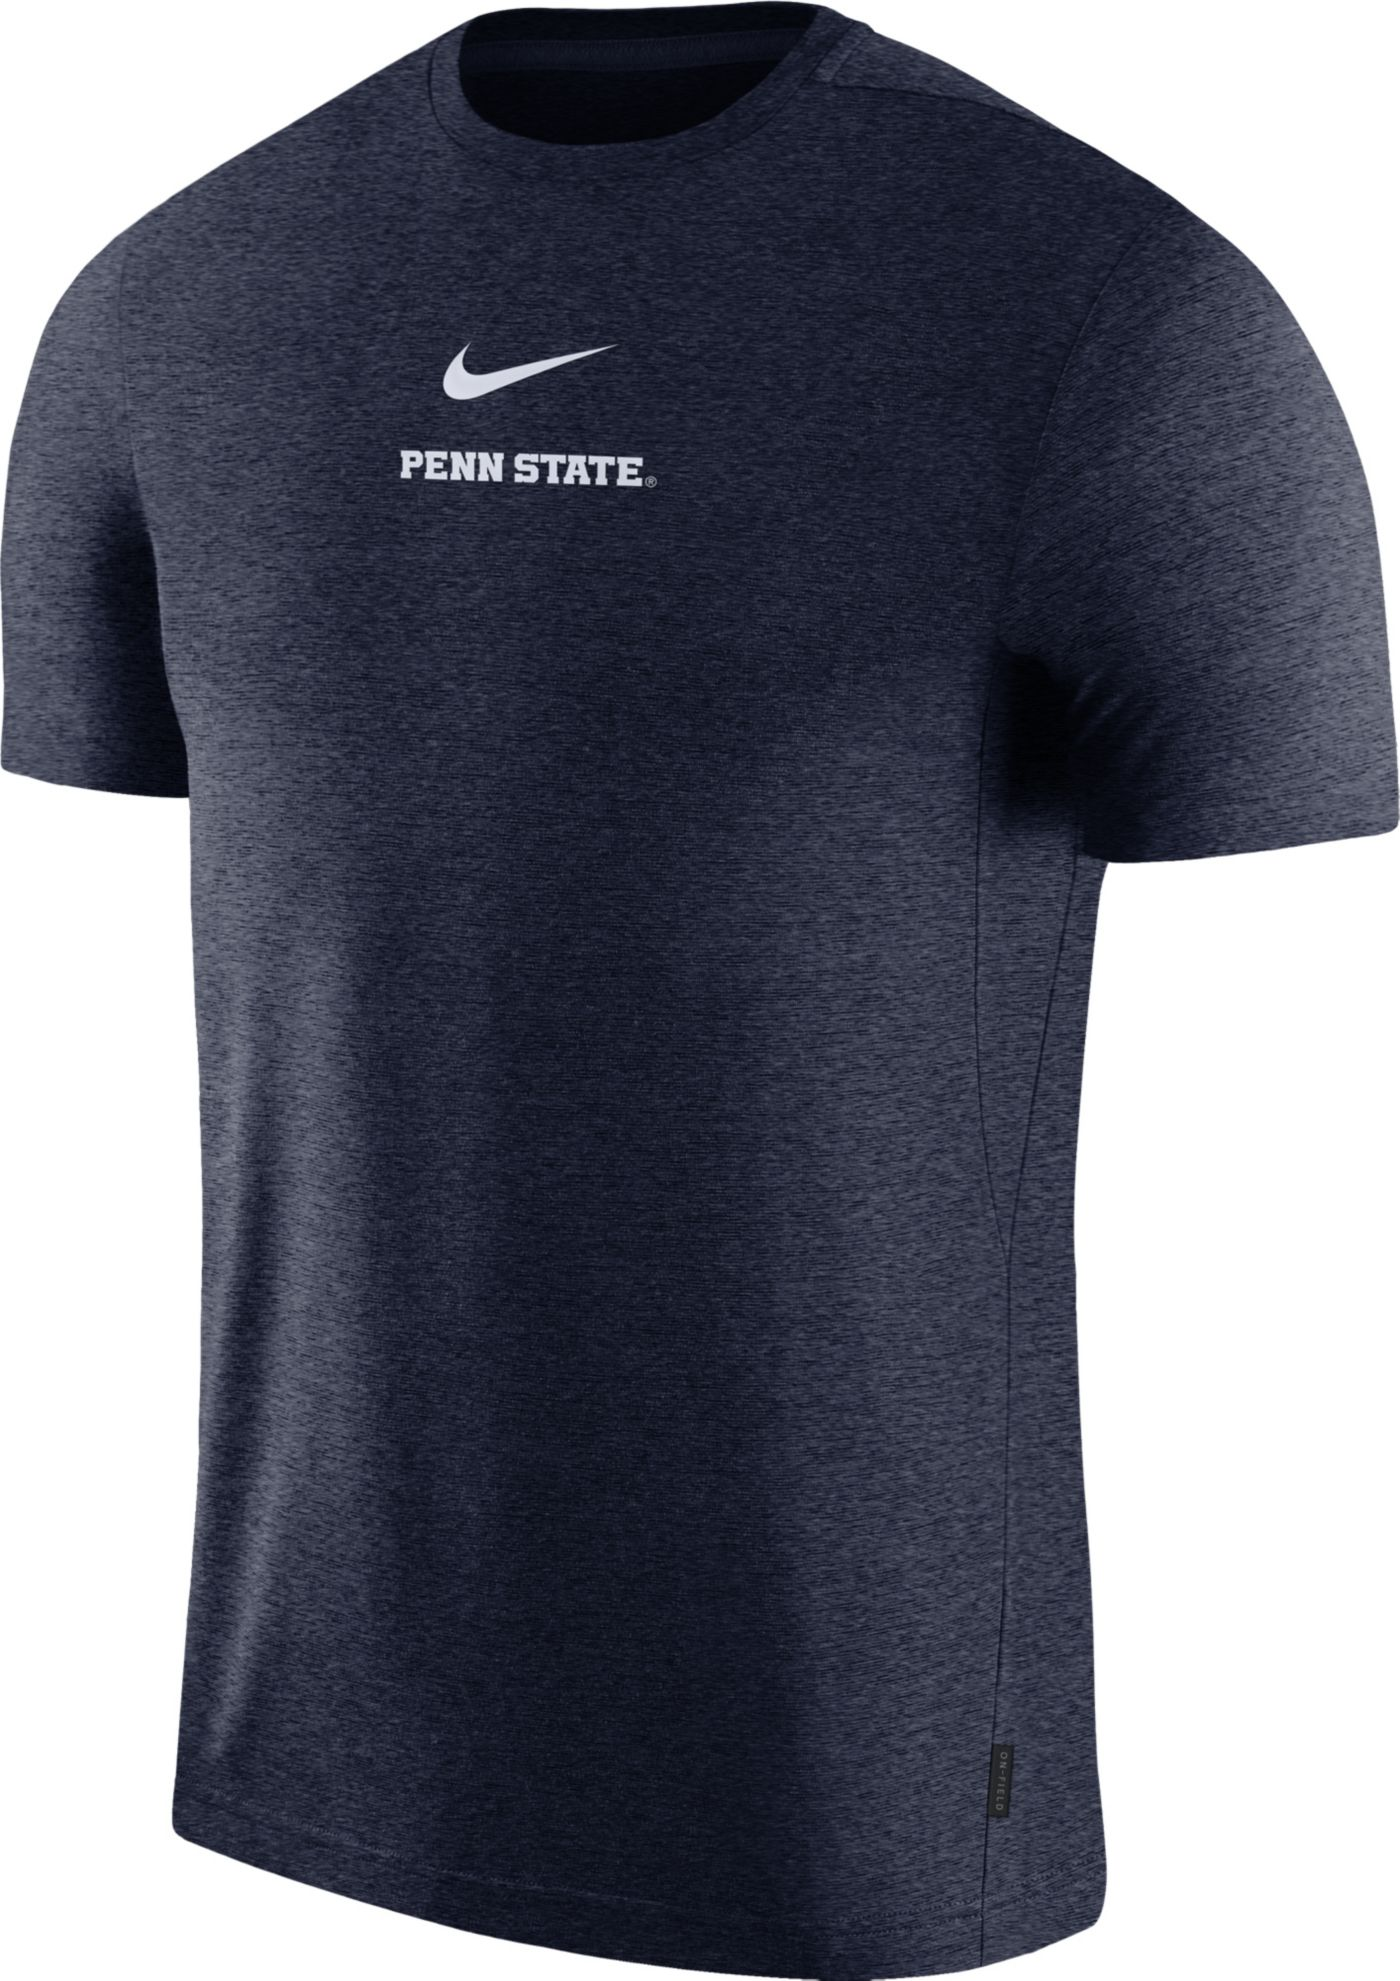 Nike Men's Penn State Nittany Lions Blue Dri-FIT Coach UV Football T-Shirt